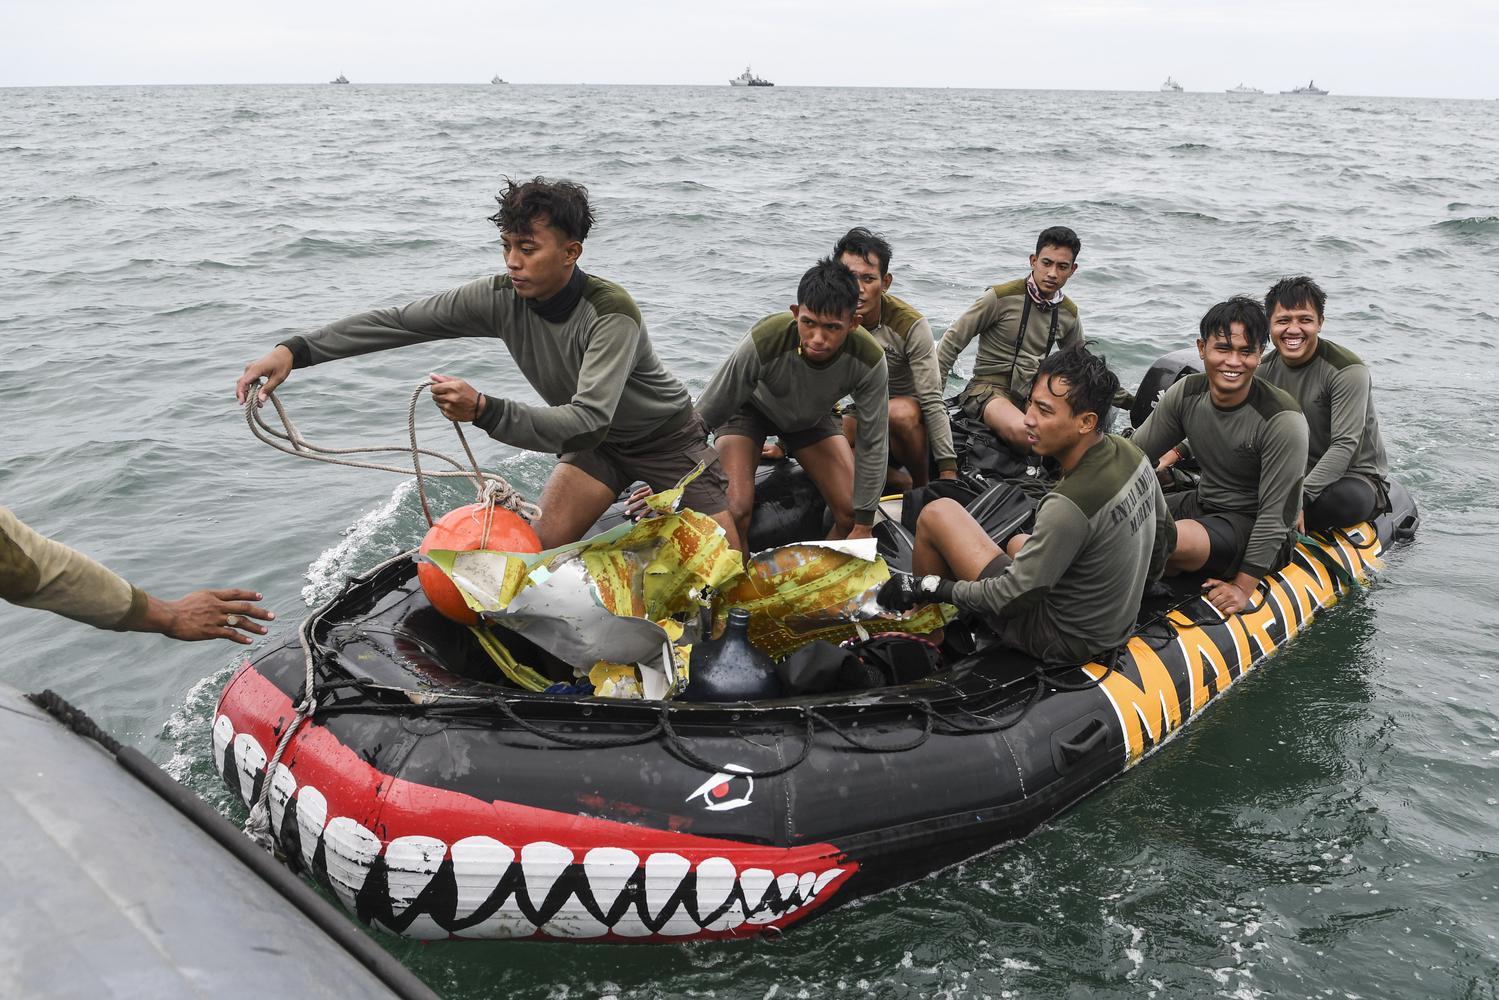 Sejumlah prajurit Batalyon Intai Amfibi 1 Korps Marinir (Yontaifib) TNI AL mengangkut serpihan dari pesawat Sriwijaya Air SJ 182 yang hilang kontak saat melakukan pencarian di perairan Kepulauan Seribu, Jakarta, Minggu (10/1/2021). Pesawat Sriwijaya Air SJ 182 yang hilang kontak pada Sabtu (9/1) sekitar pukul 14.40 WIB di ketinggian 10 ribu kaki tersebut membawa enam awak dan 56 penumpang.